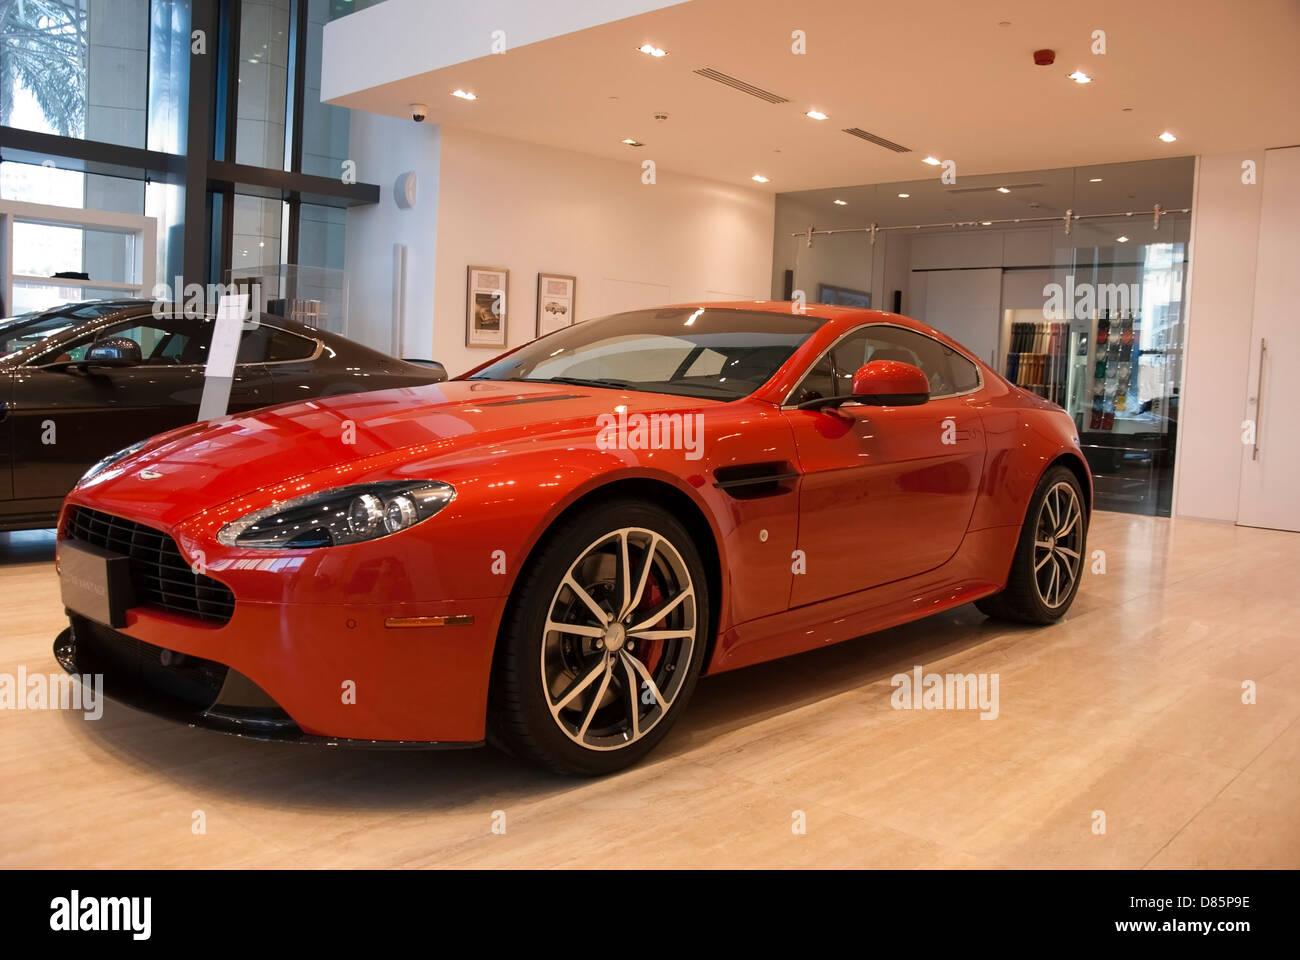 2013 Volcano Red Aston Martin V8 Vantage Sports Coupe Sportscar Stock Photo Alamy